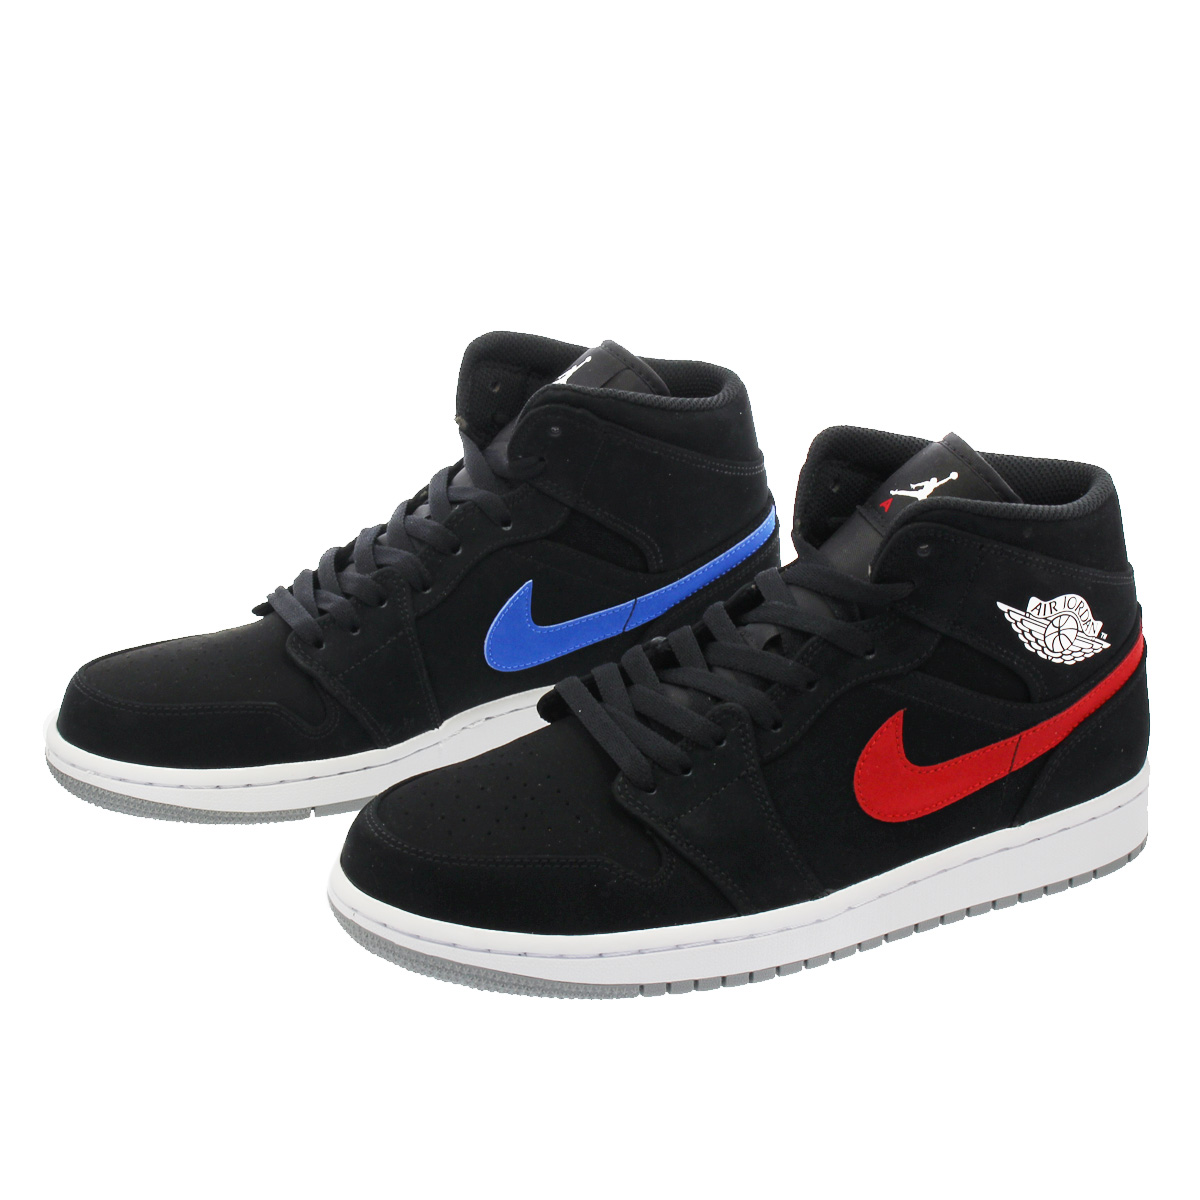 ac38a21e4d453a NIKE AIR JORDAN 1 MID Nike Air Jordan 1 mid BLACK MULTI COLOR RED BLUE  554